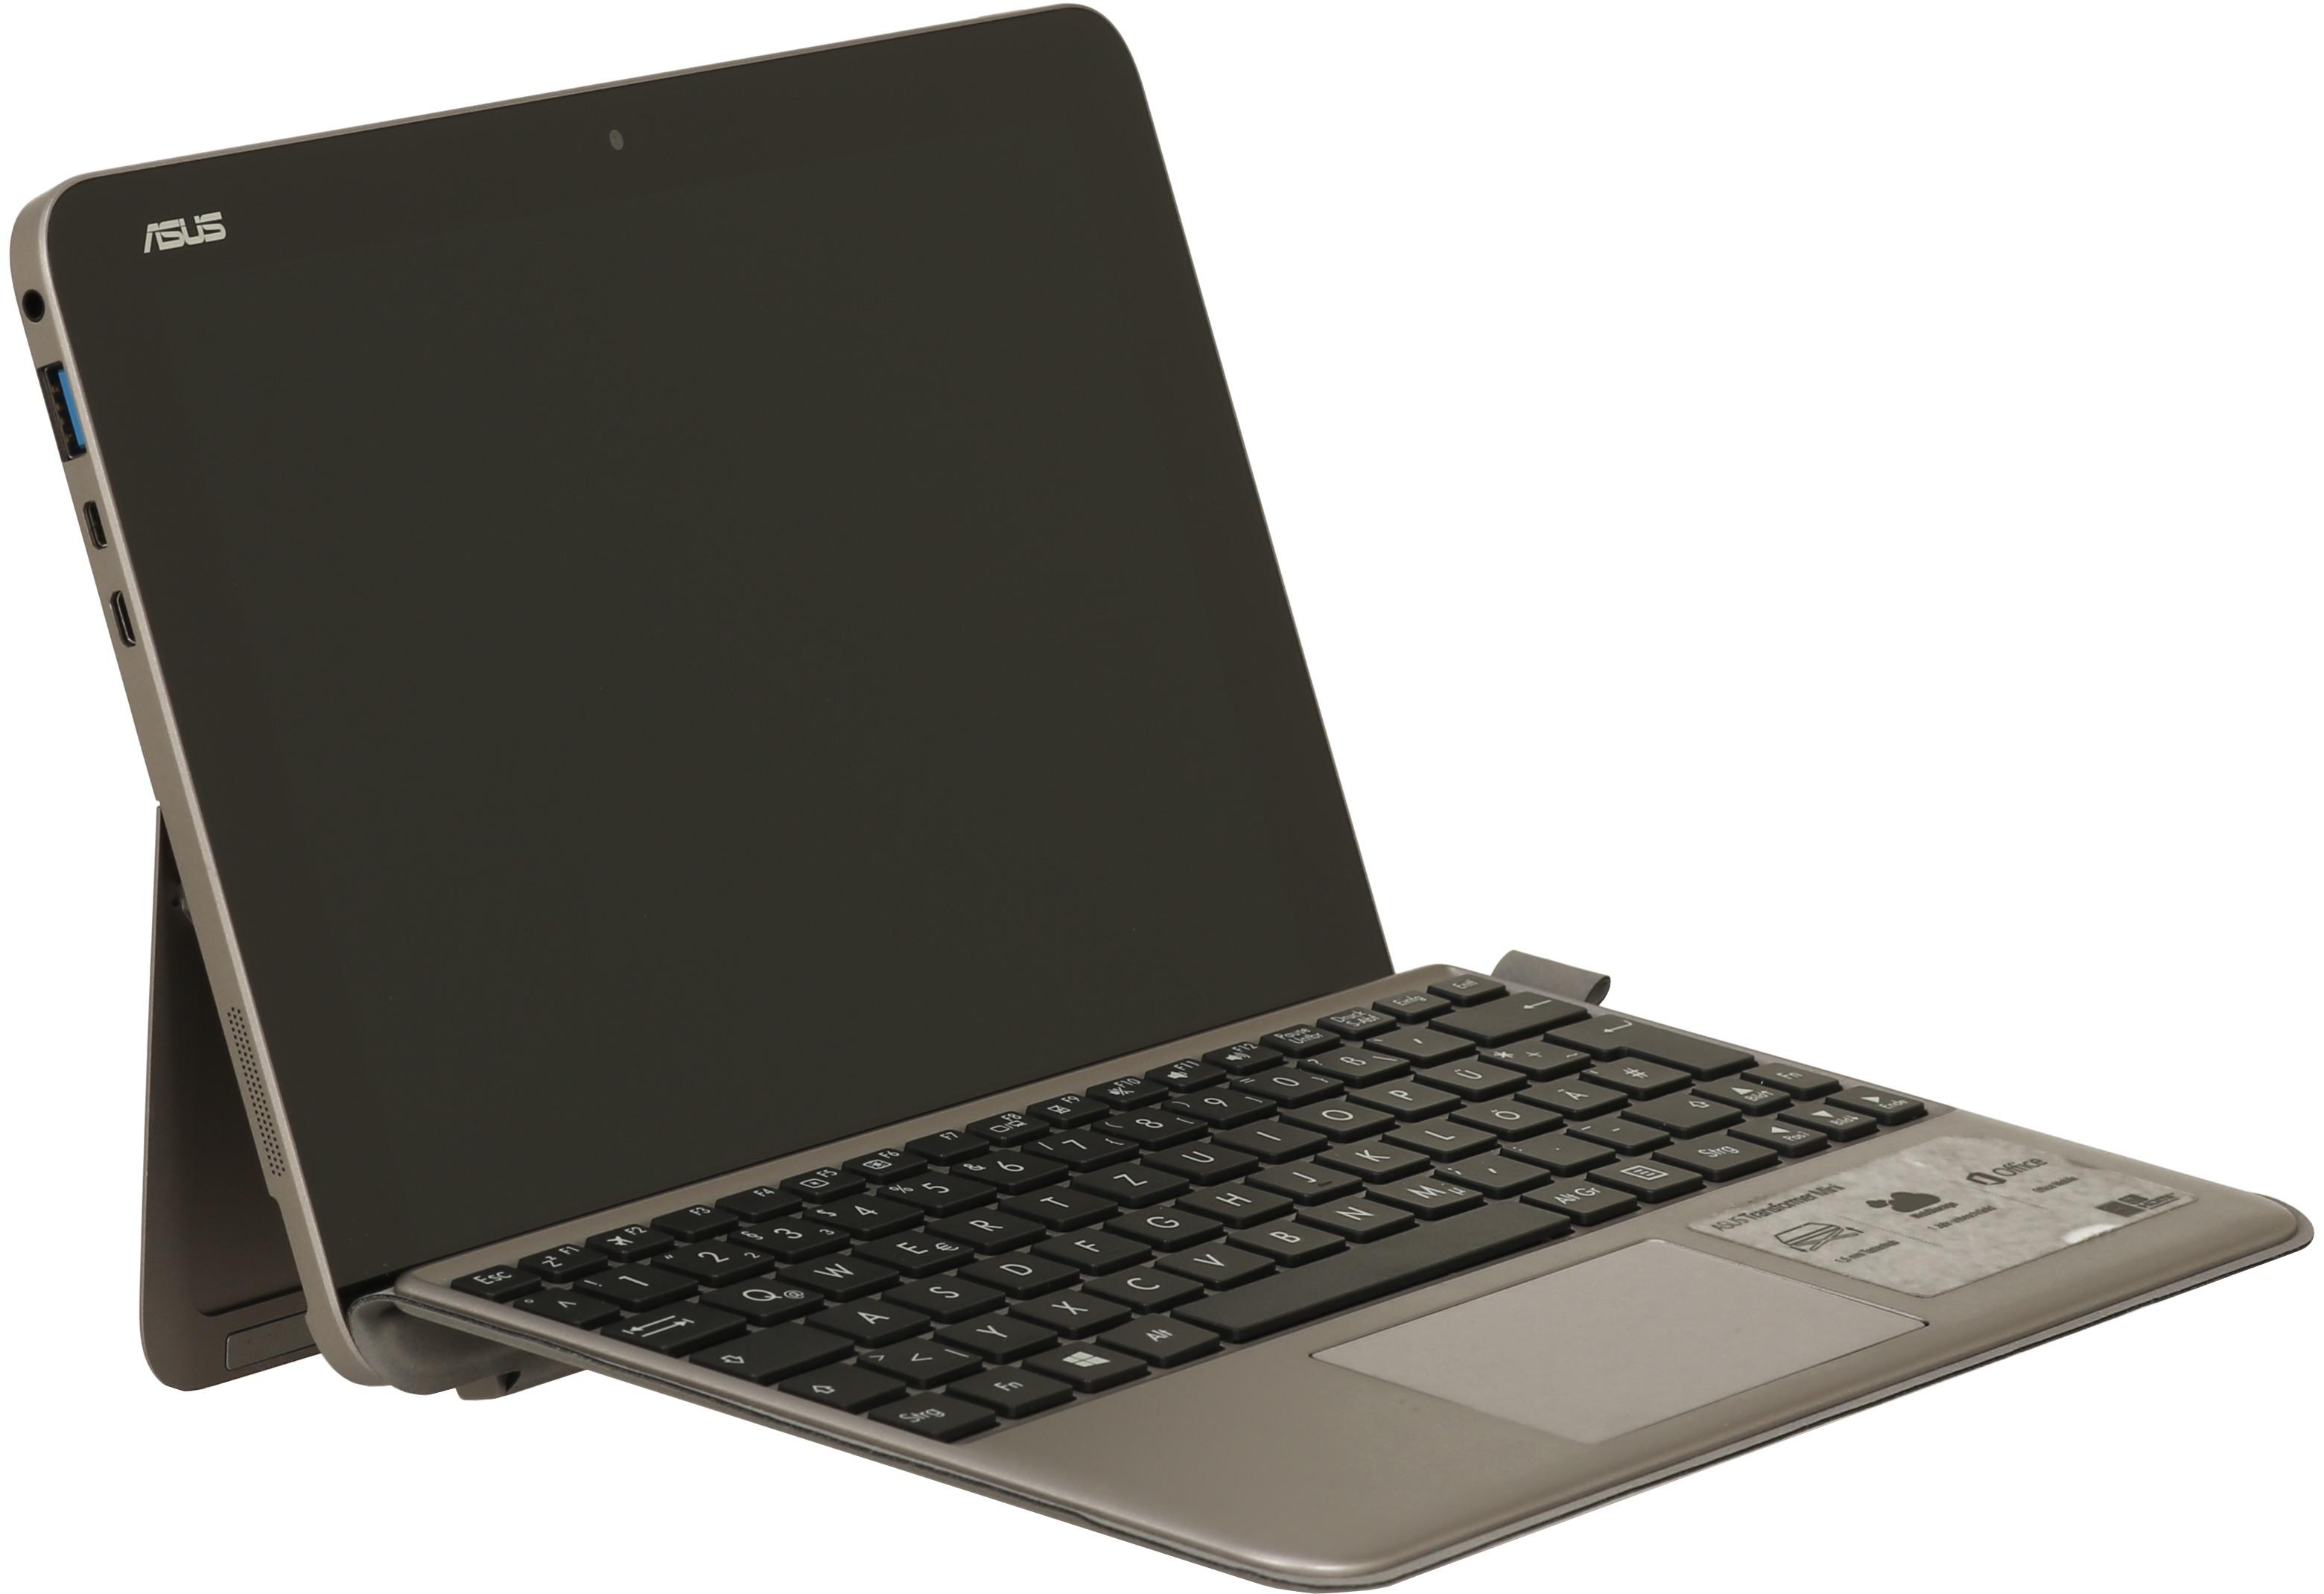 Asus Transformer Book Mini T102HA 10,1 1,4 GHz Intel Atom 64GB eMMC [Wi-Fi, inkl. Keyboard Dock] glacier gray